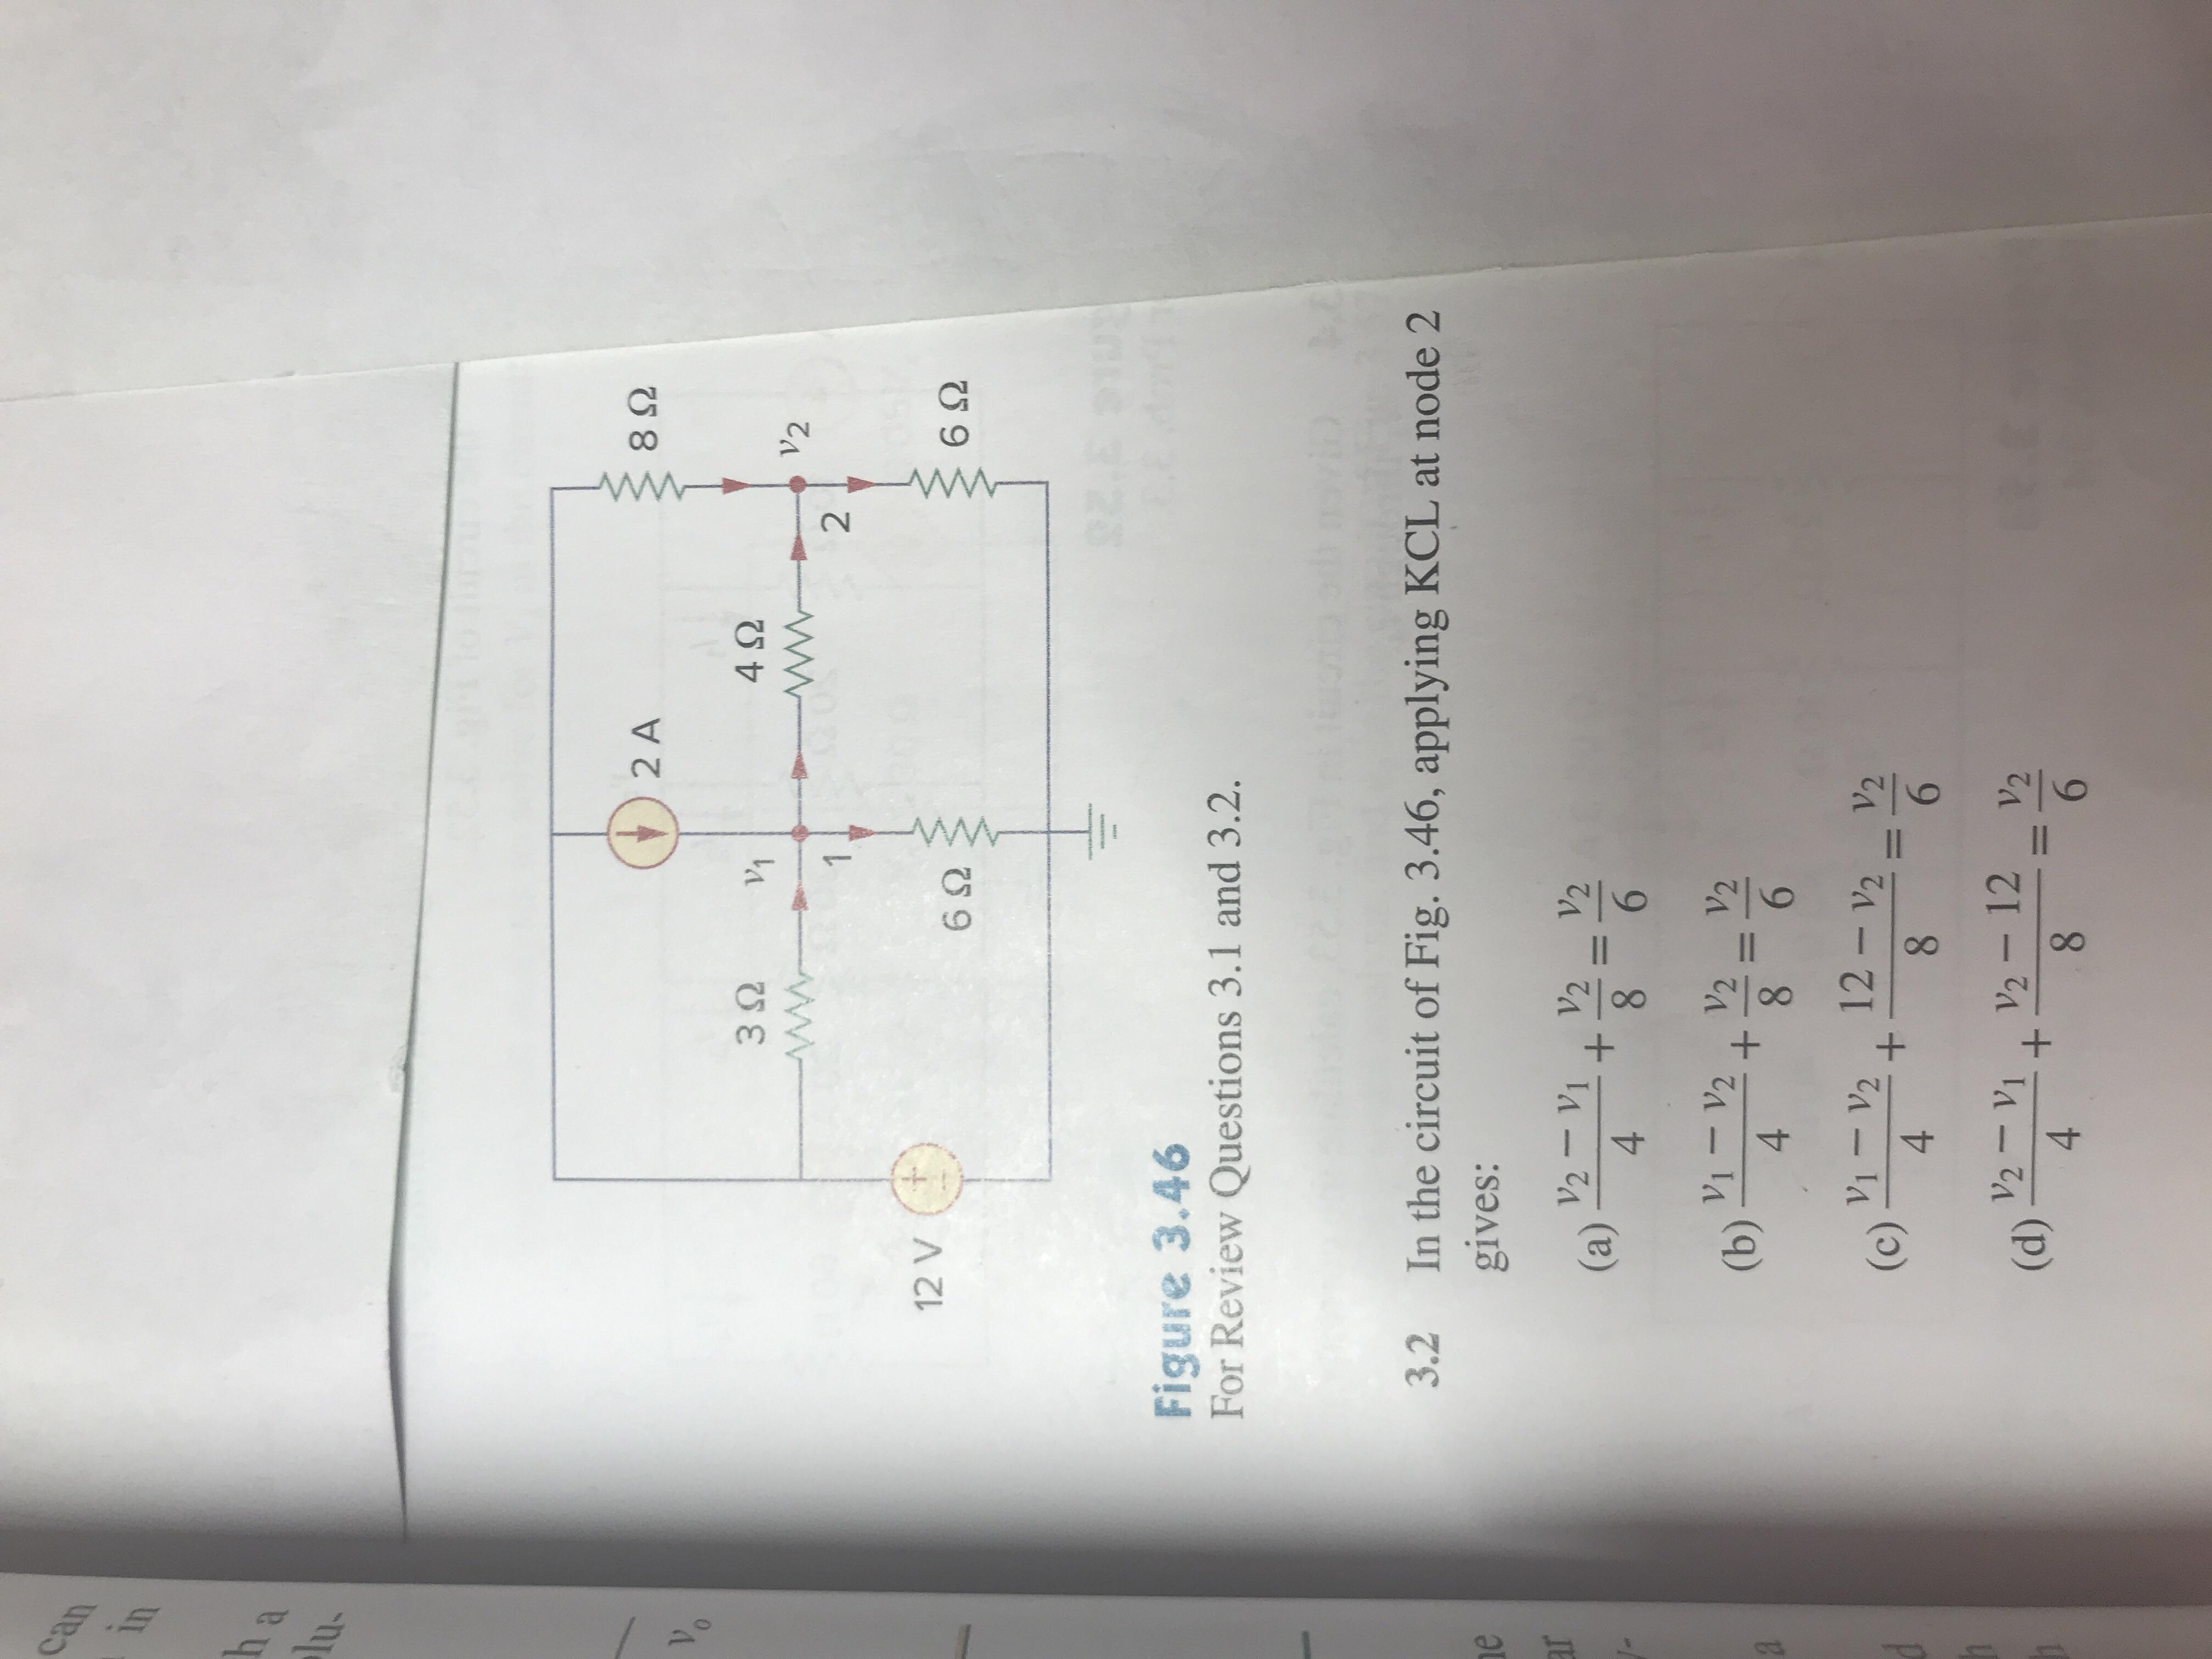 2 A 8Ω 4Ω 12 V 6Ω 6Ω HI- Figure 3.46 For Review Questions 3.1 and 3.2. 3.2 In the circuit of Fig. 3.46, applying KCL at node 2 gives: 4 1V2,V2 V 4 V1-V2 · 12-V2 V2